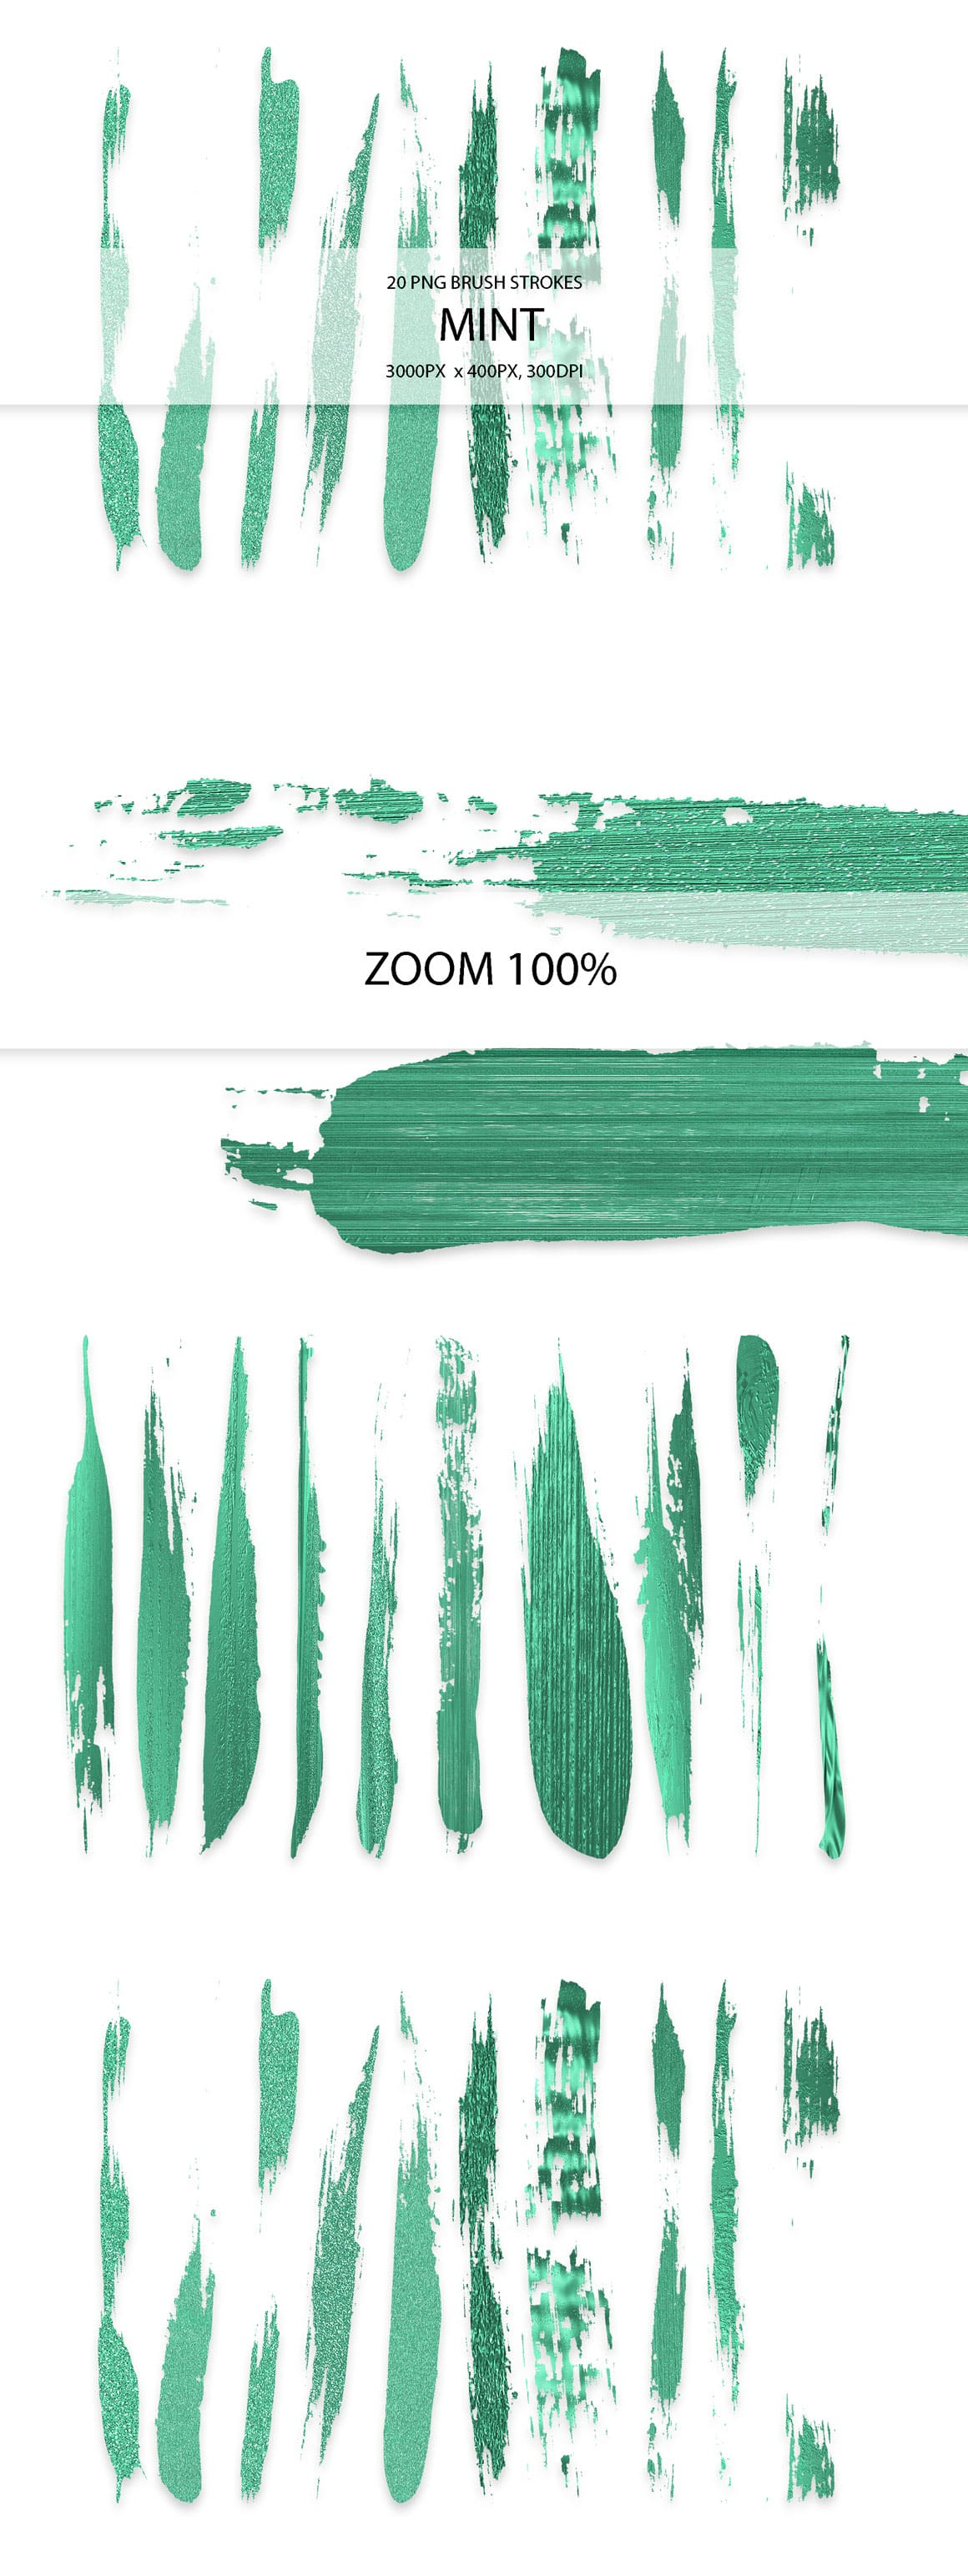 829 Acrylic Brush Strokes and Digital Brush Strokes - $9 - MintStrokes 01 min